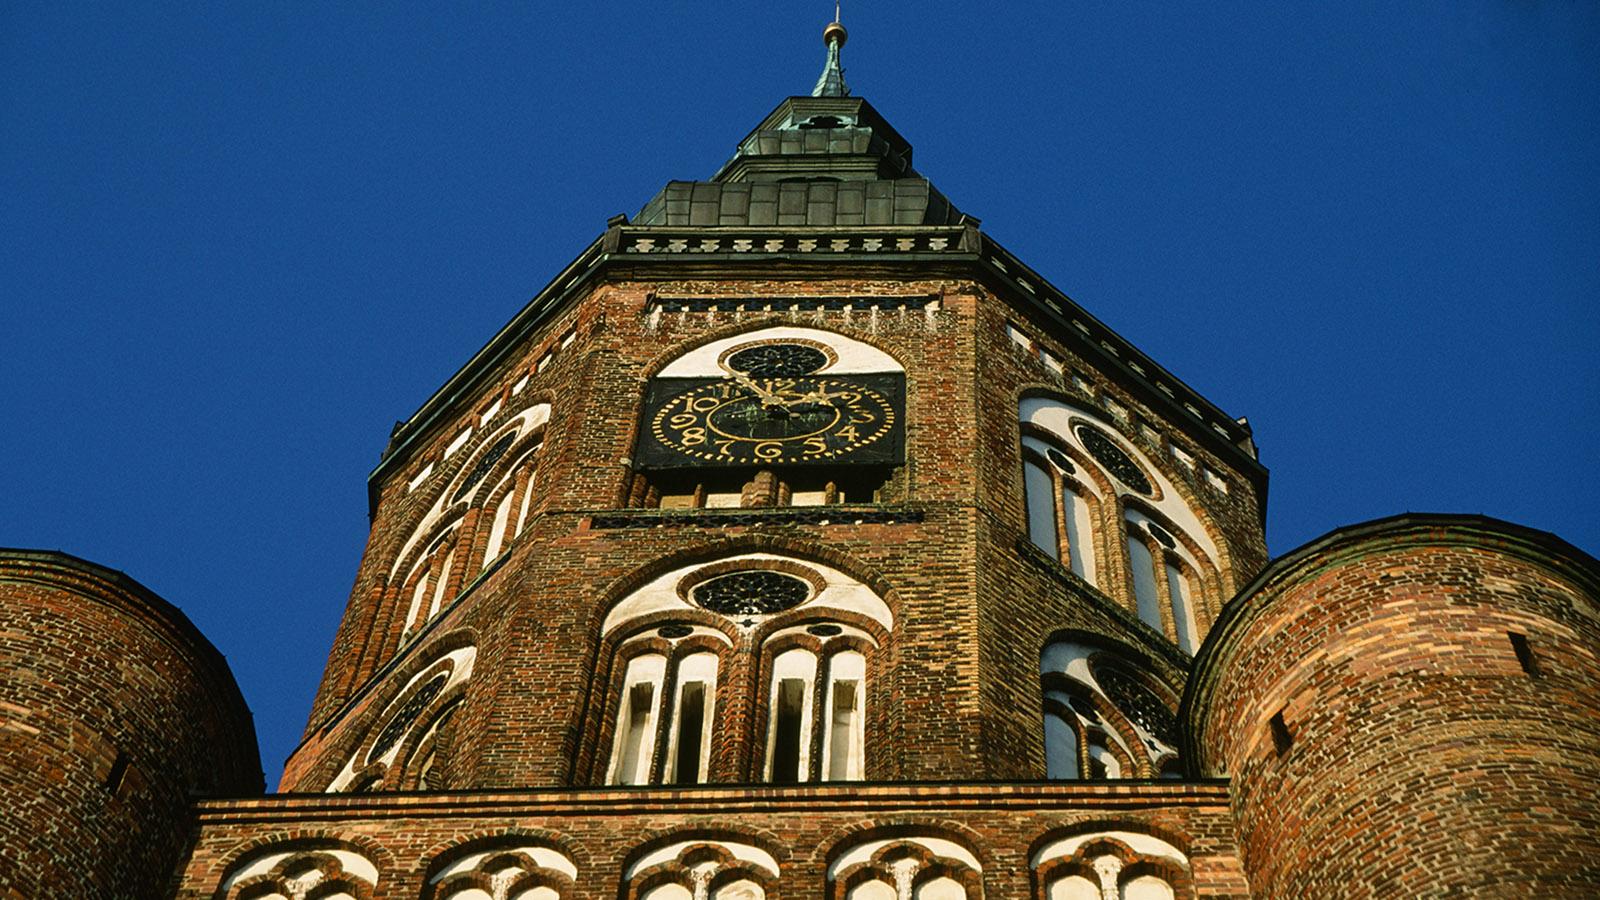 E): Beeindruckende Backsteingotik: der Turm des Greifswalder Domes Foto: Hilke Maunder